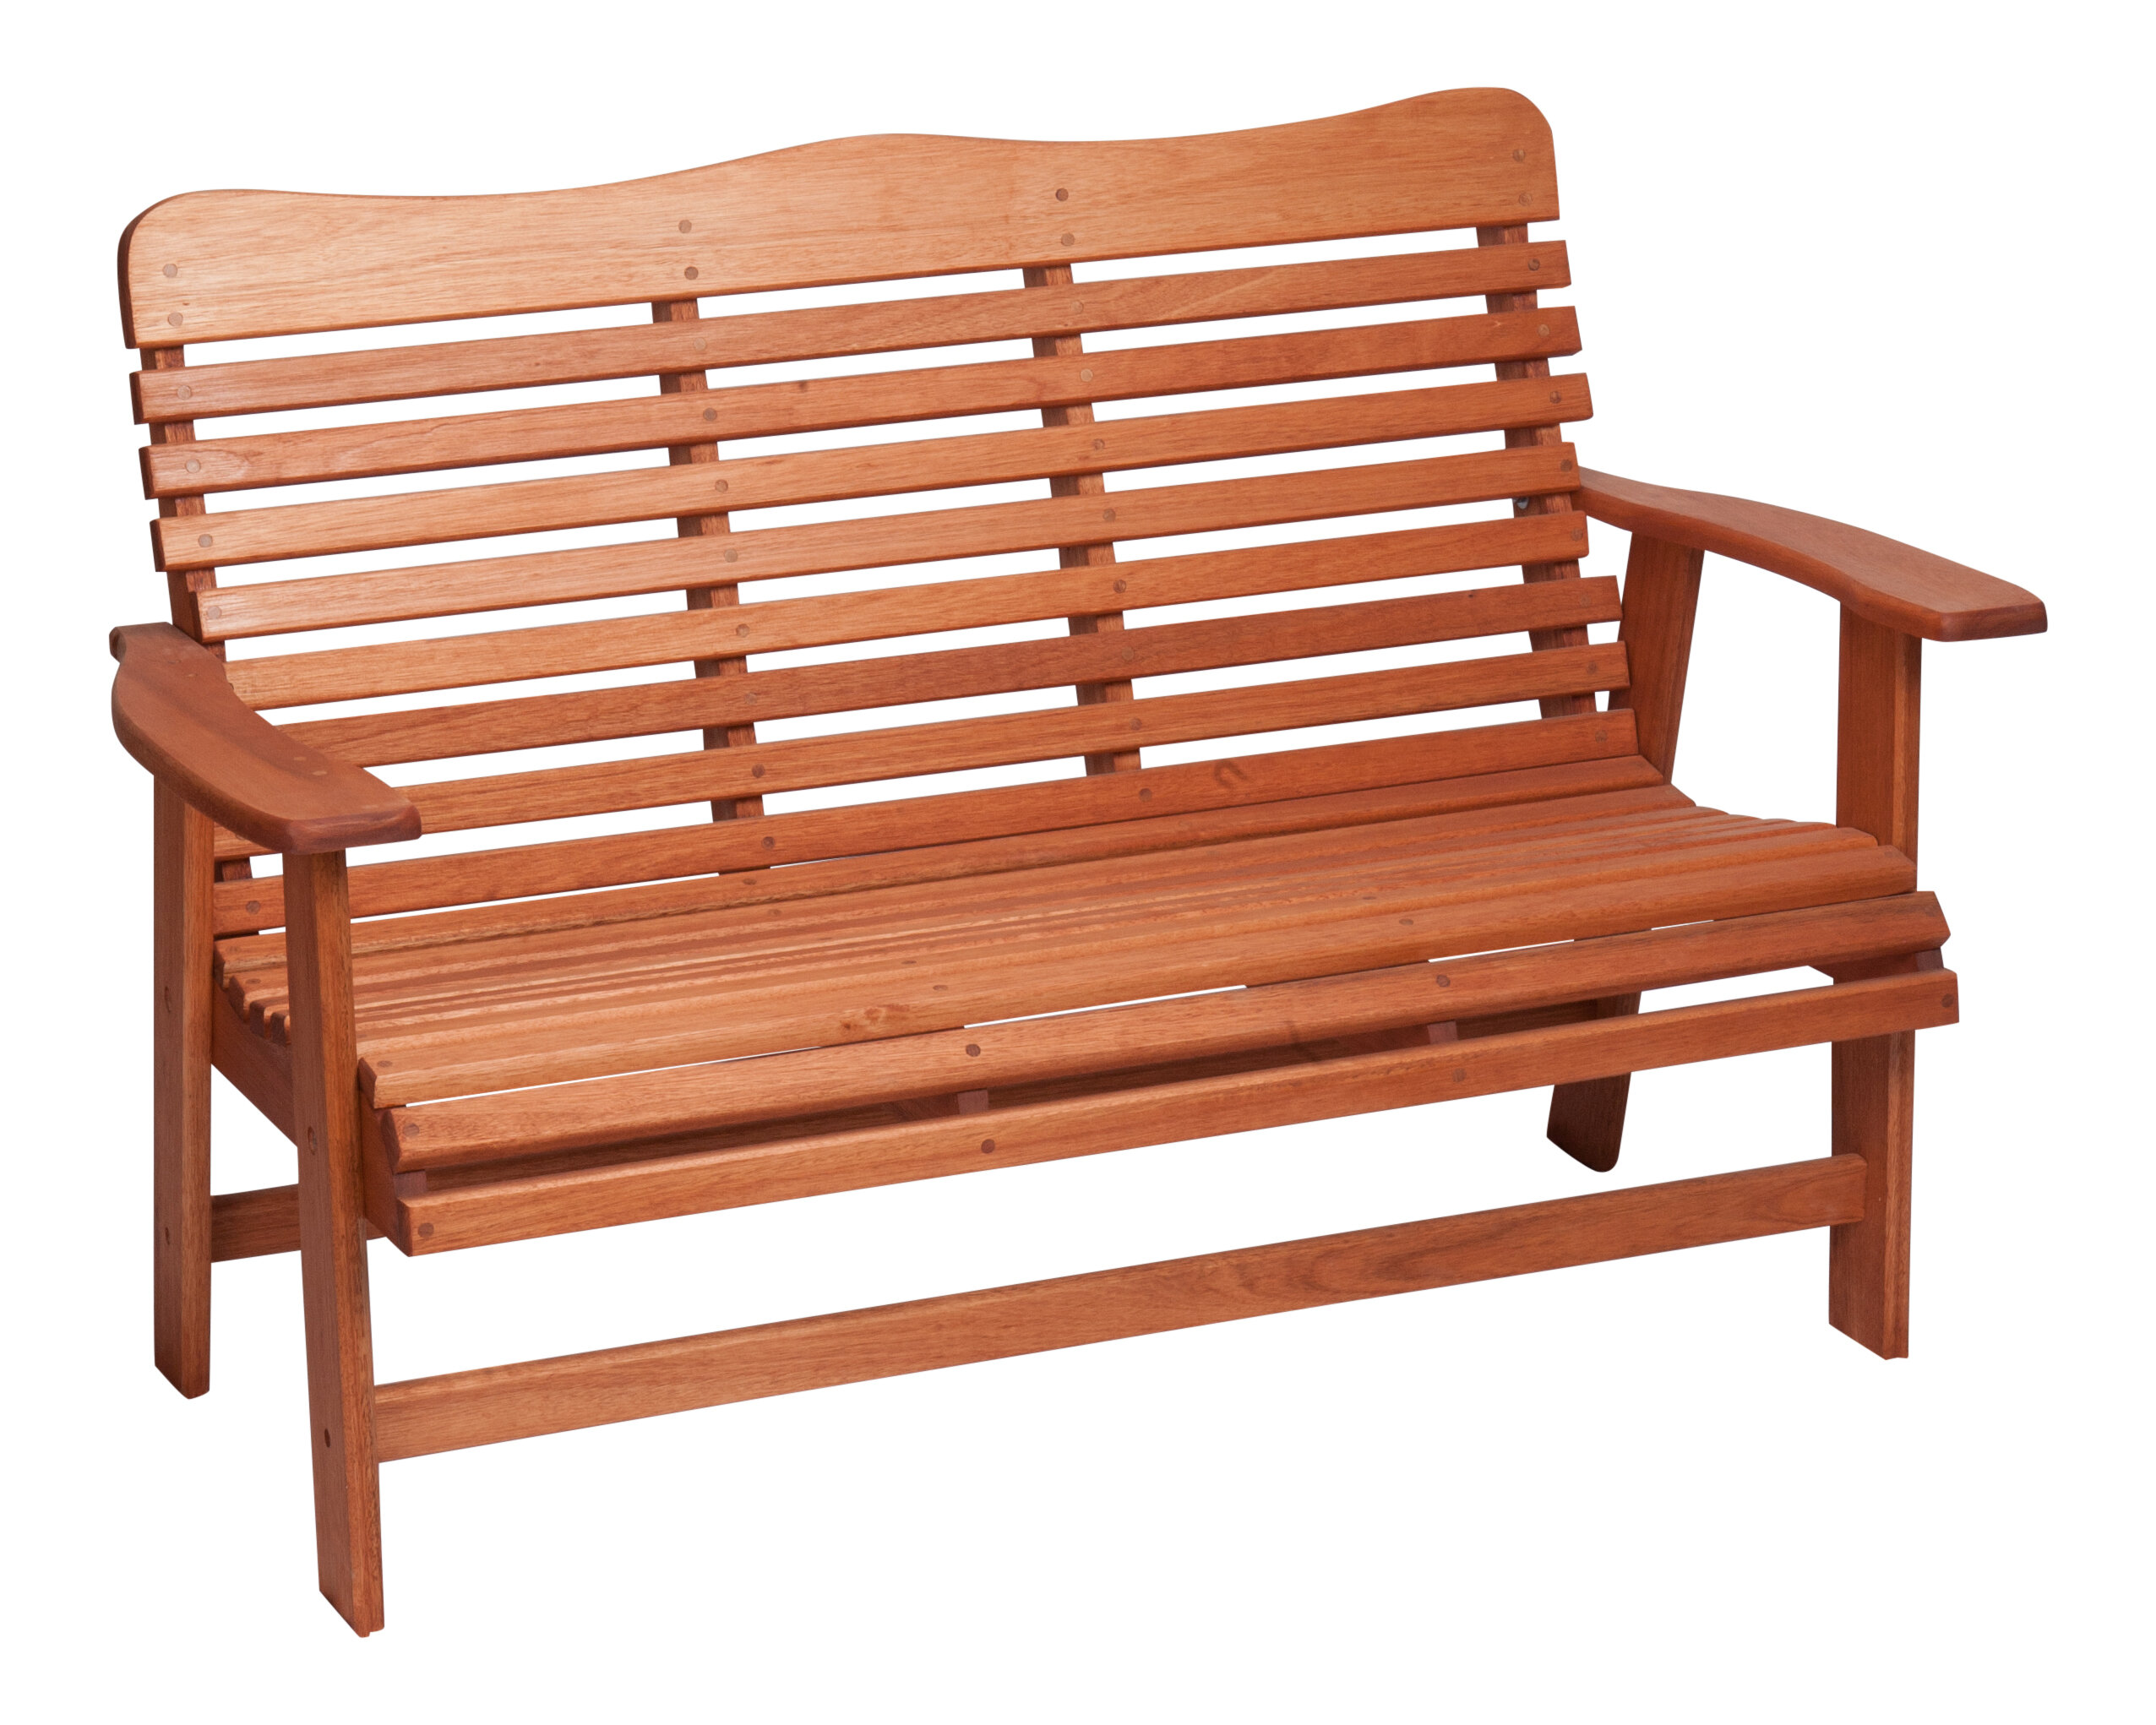 Hinkle Chair Company Red Grandis Wood Garden Bench | Wayfair